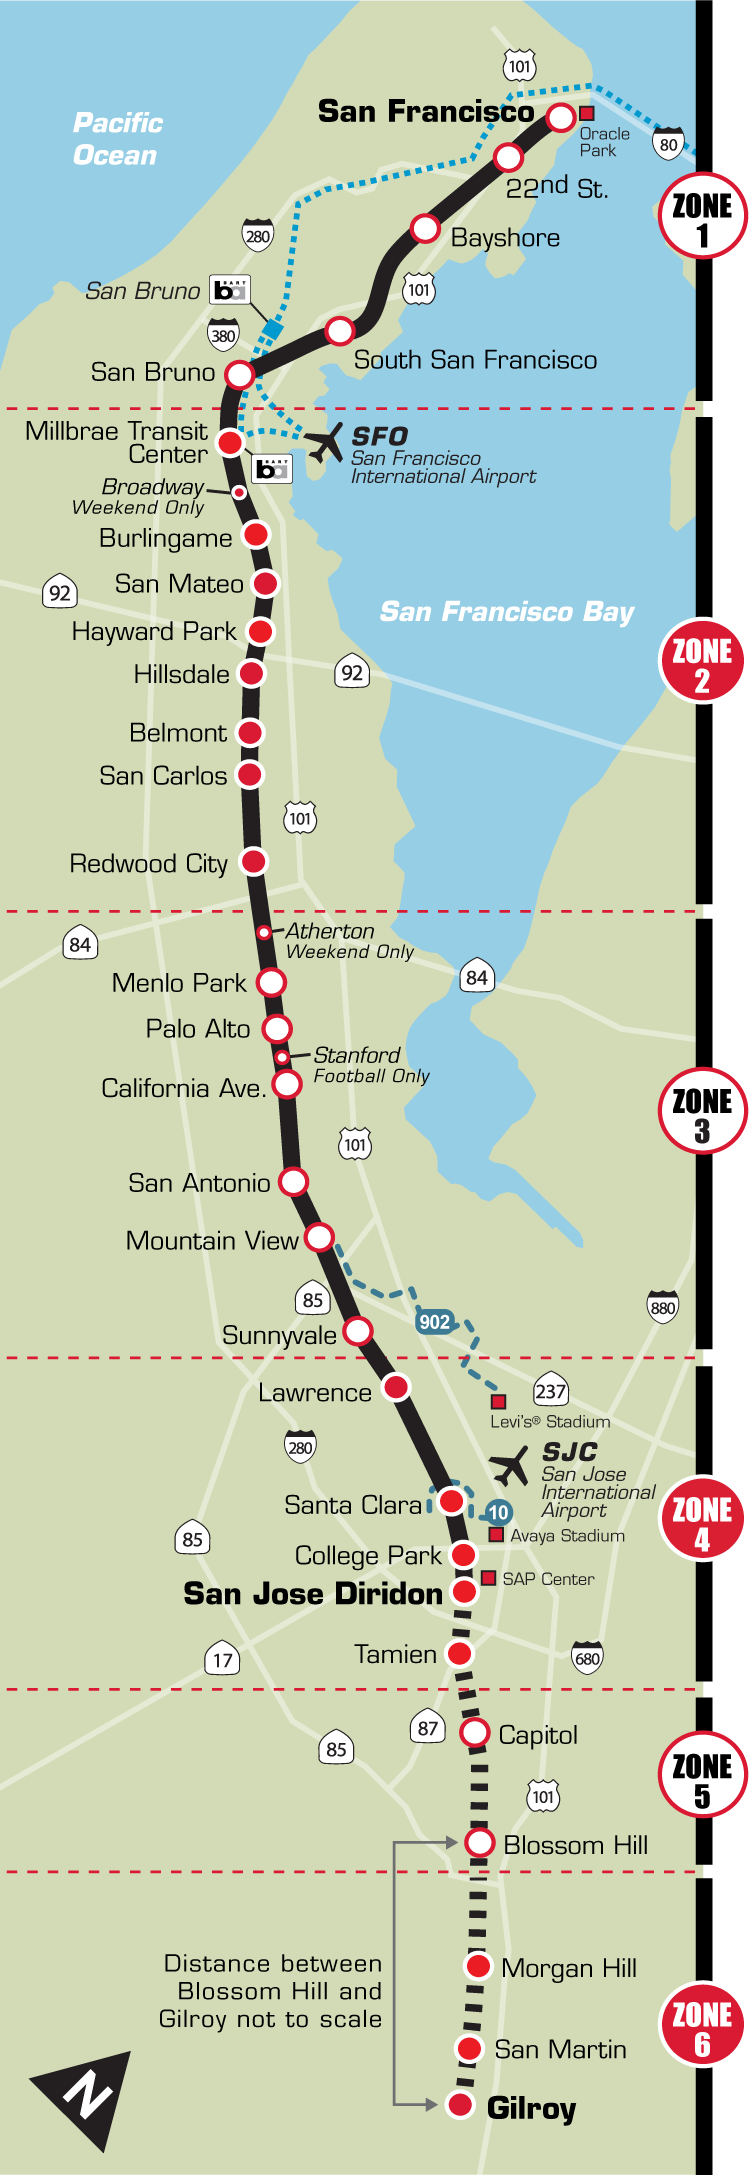 Plano de tren Caltrain